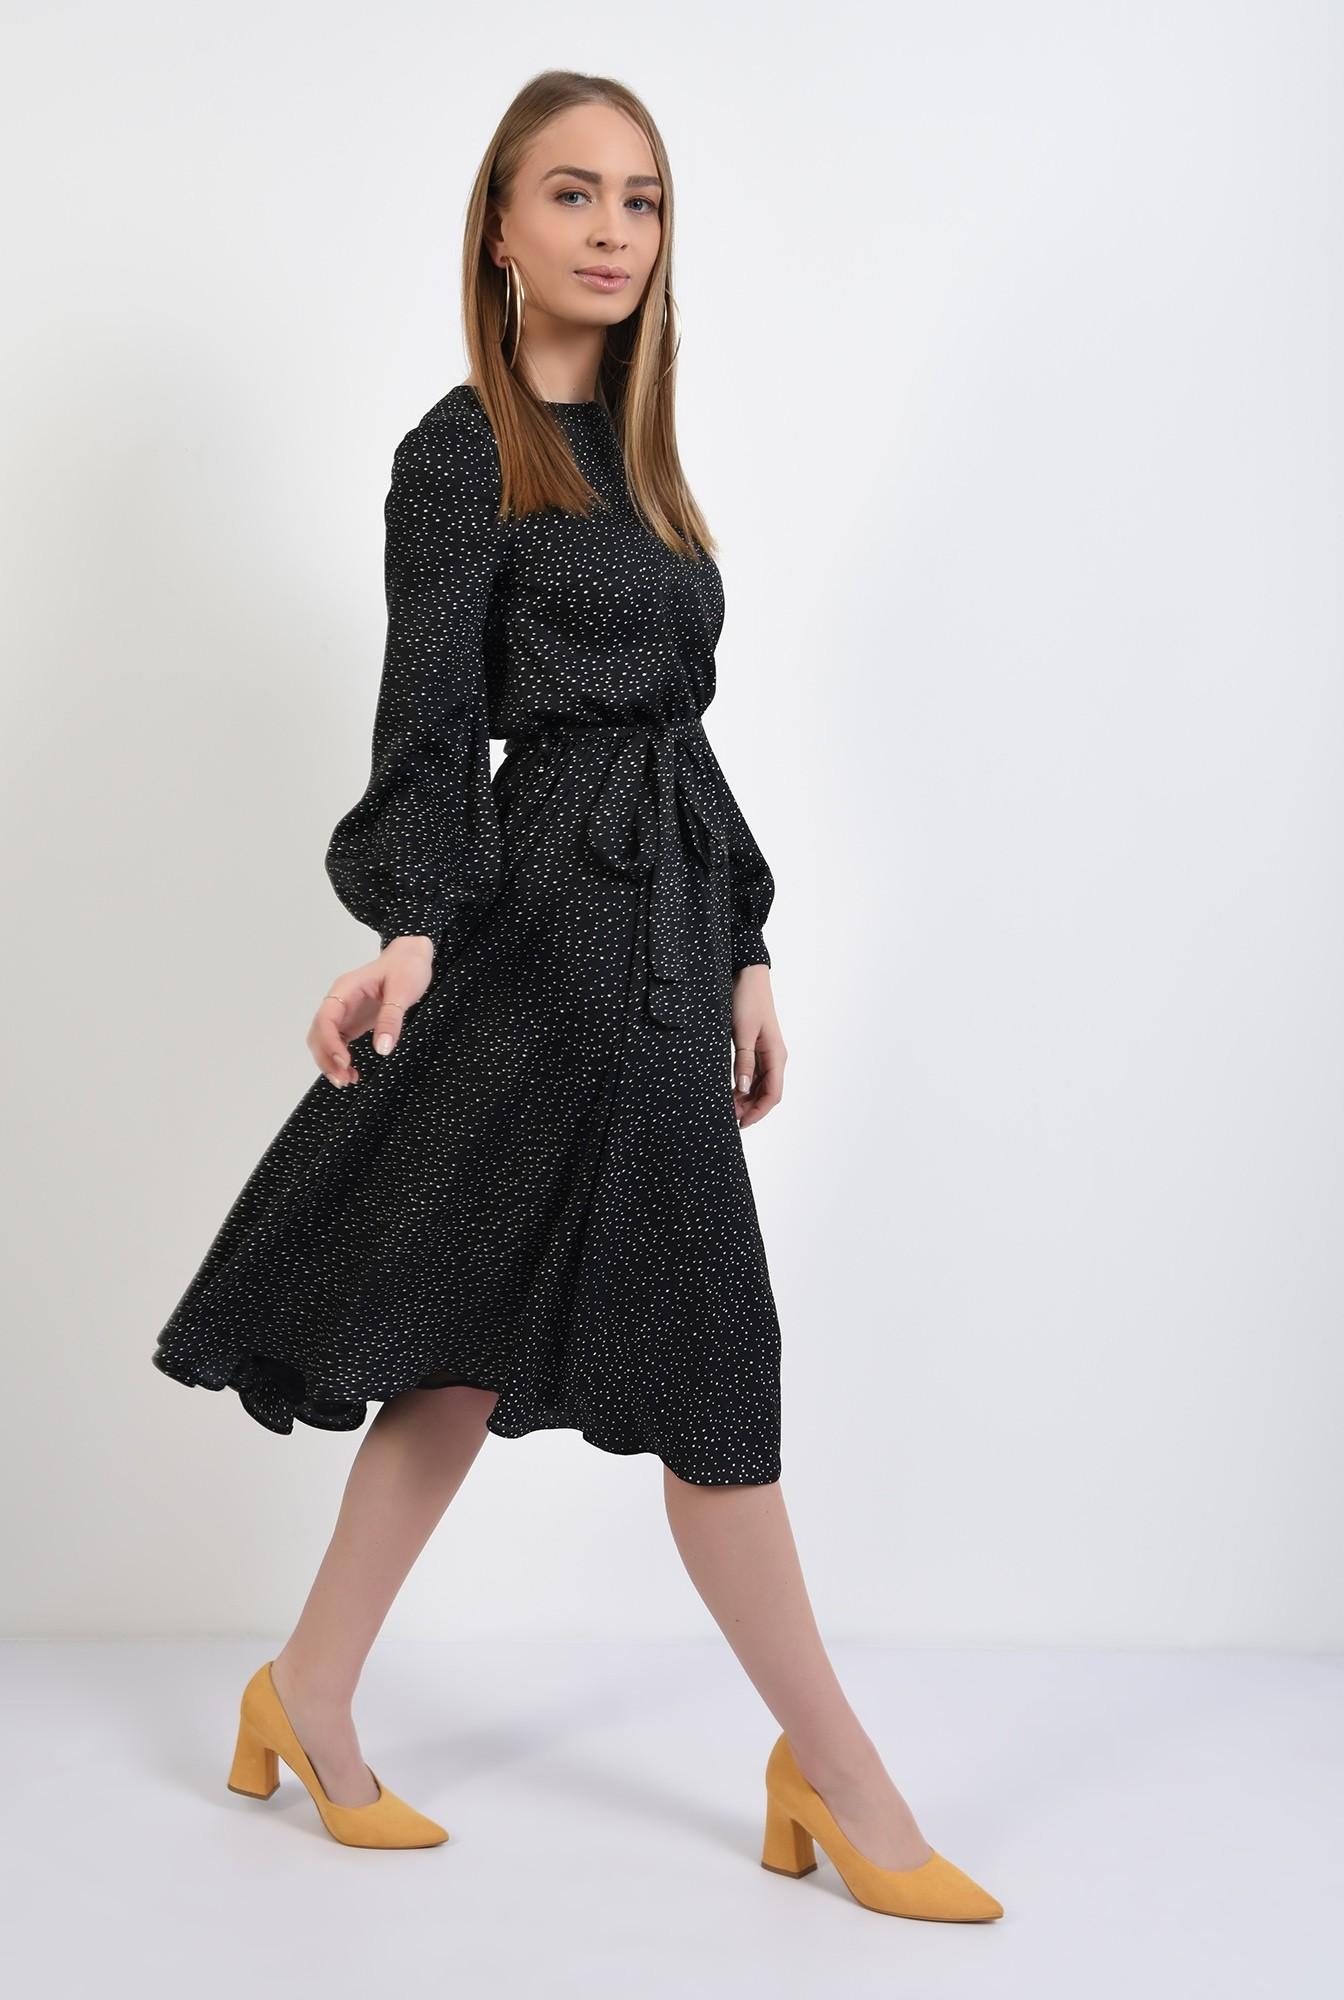 360 - rochie midi, cu picouri, satin imprimat, clos, rochie de primavara